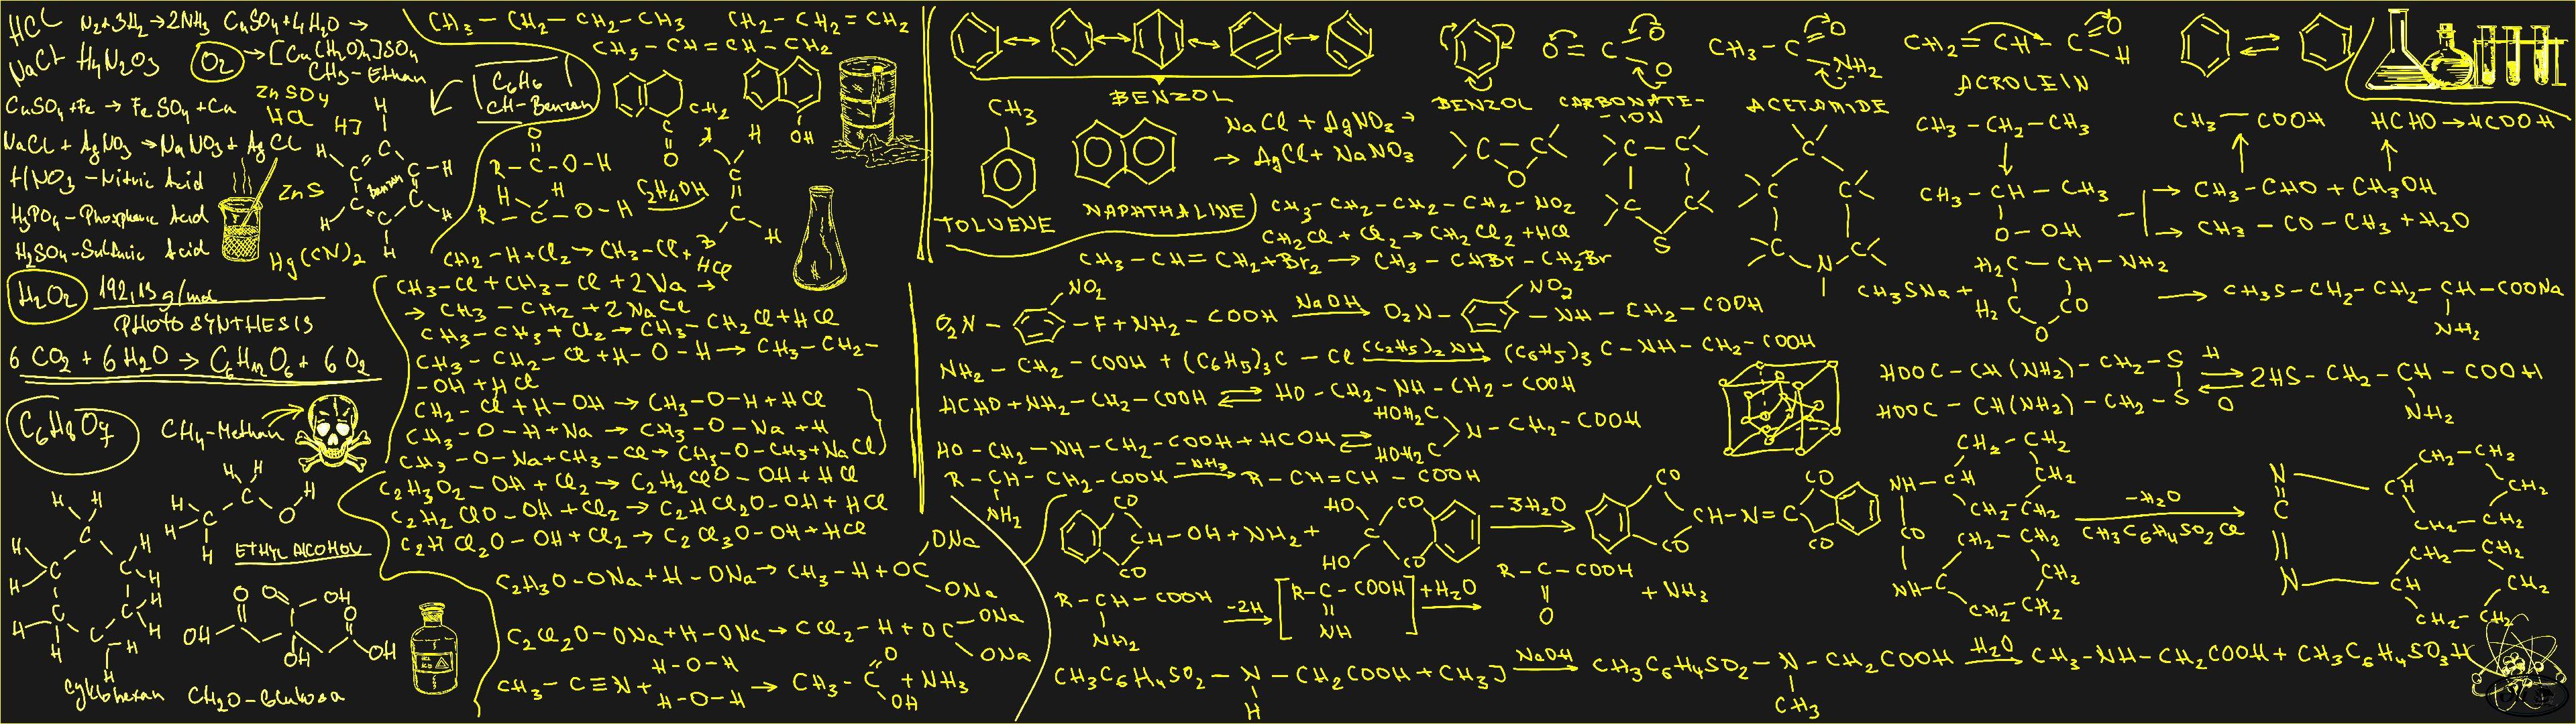 Organic Chemistry By Cutty Sark On Deviantart